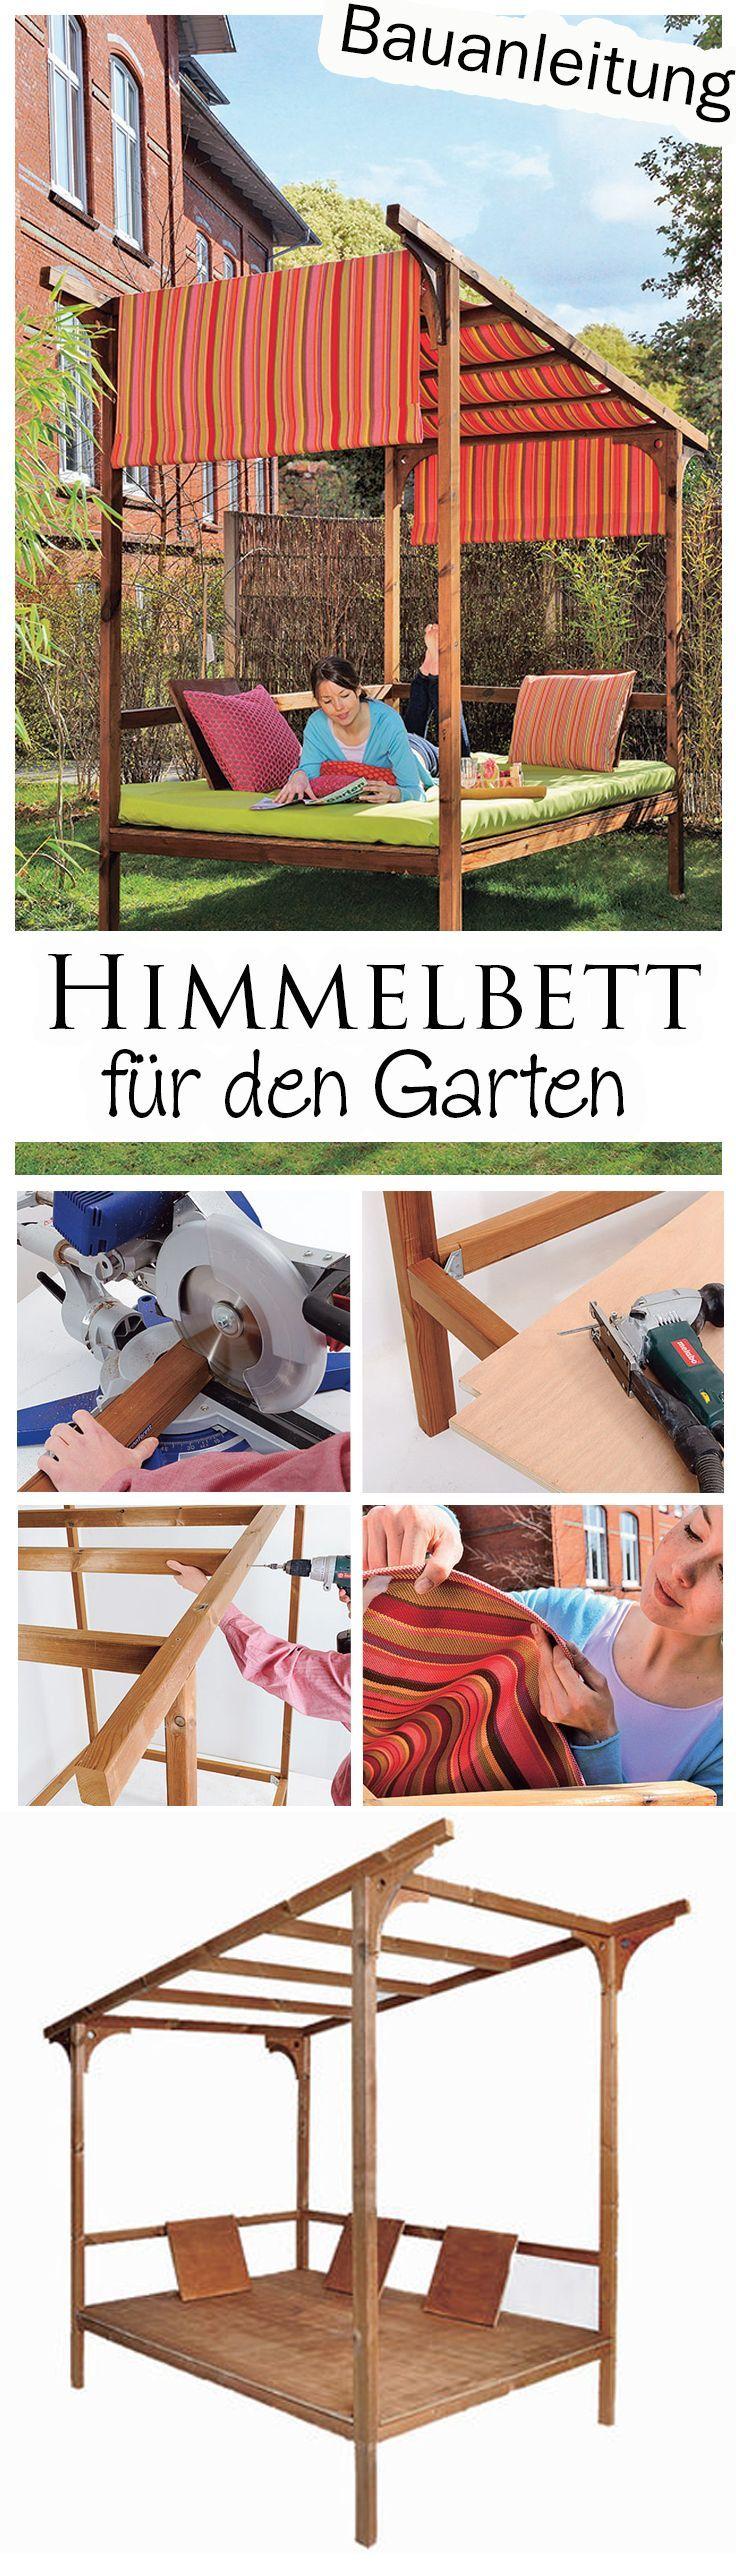 1000+ ideas about Himmelbett Selber Machen on Pinterest ...